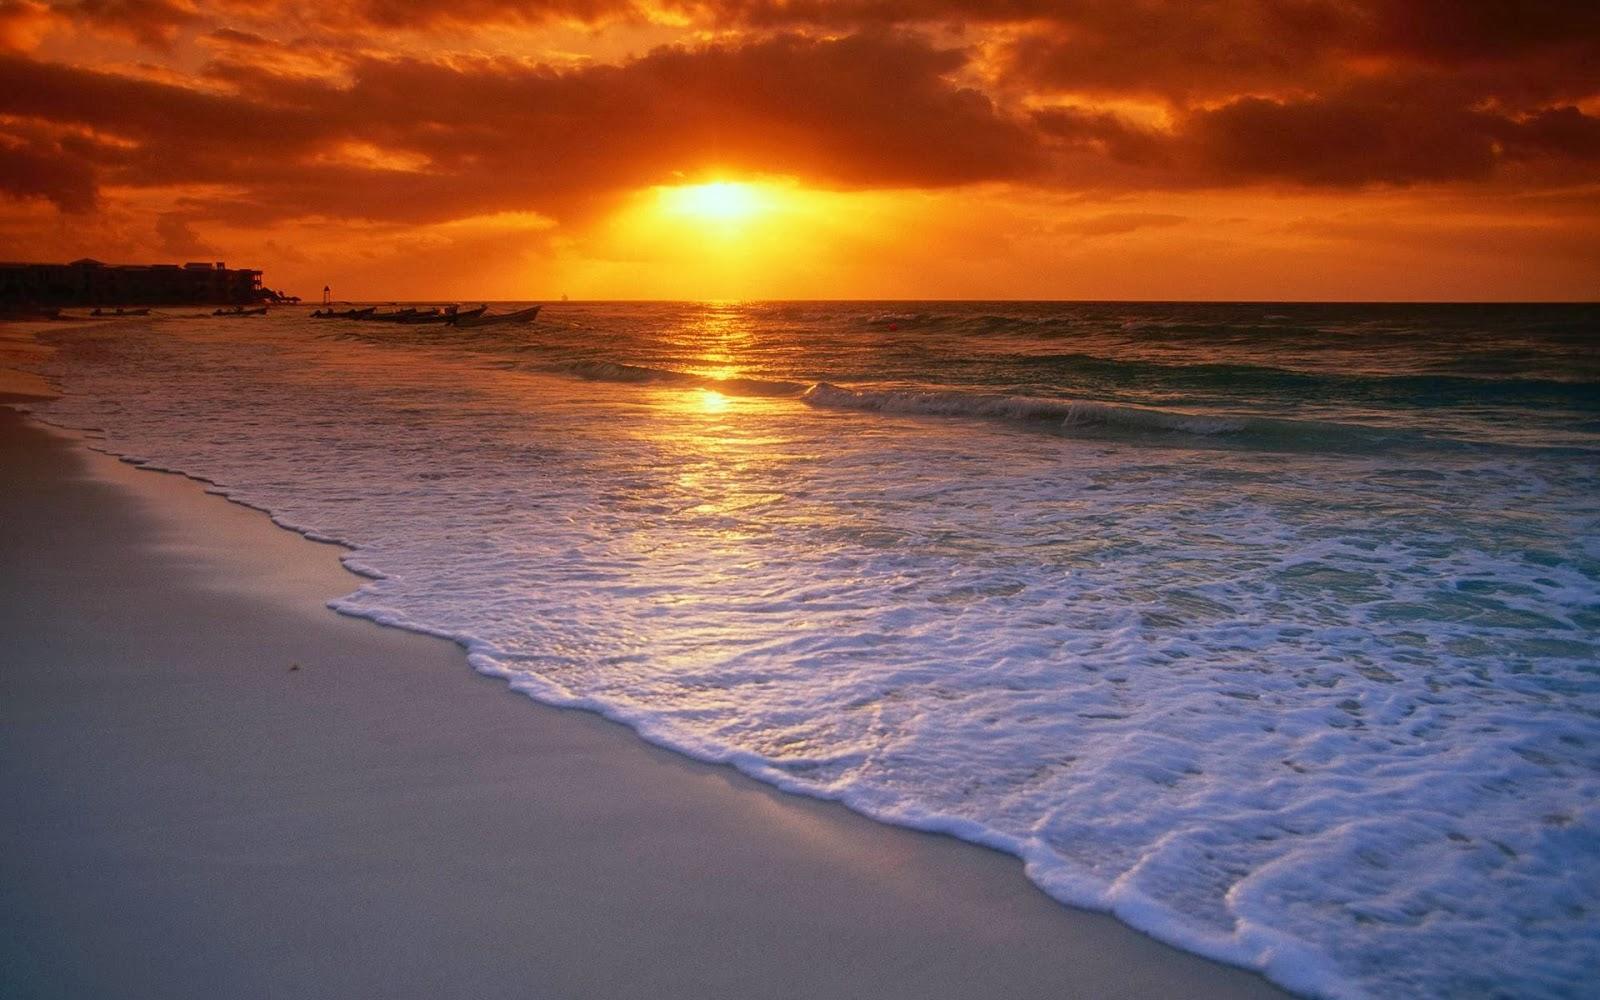 wallpapers For Desktop: HD Sunset wallpapers